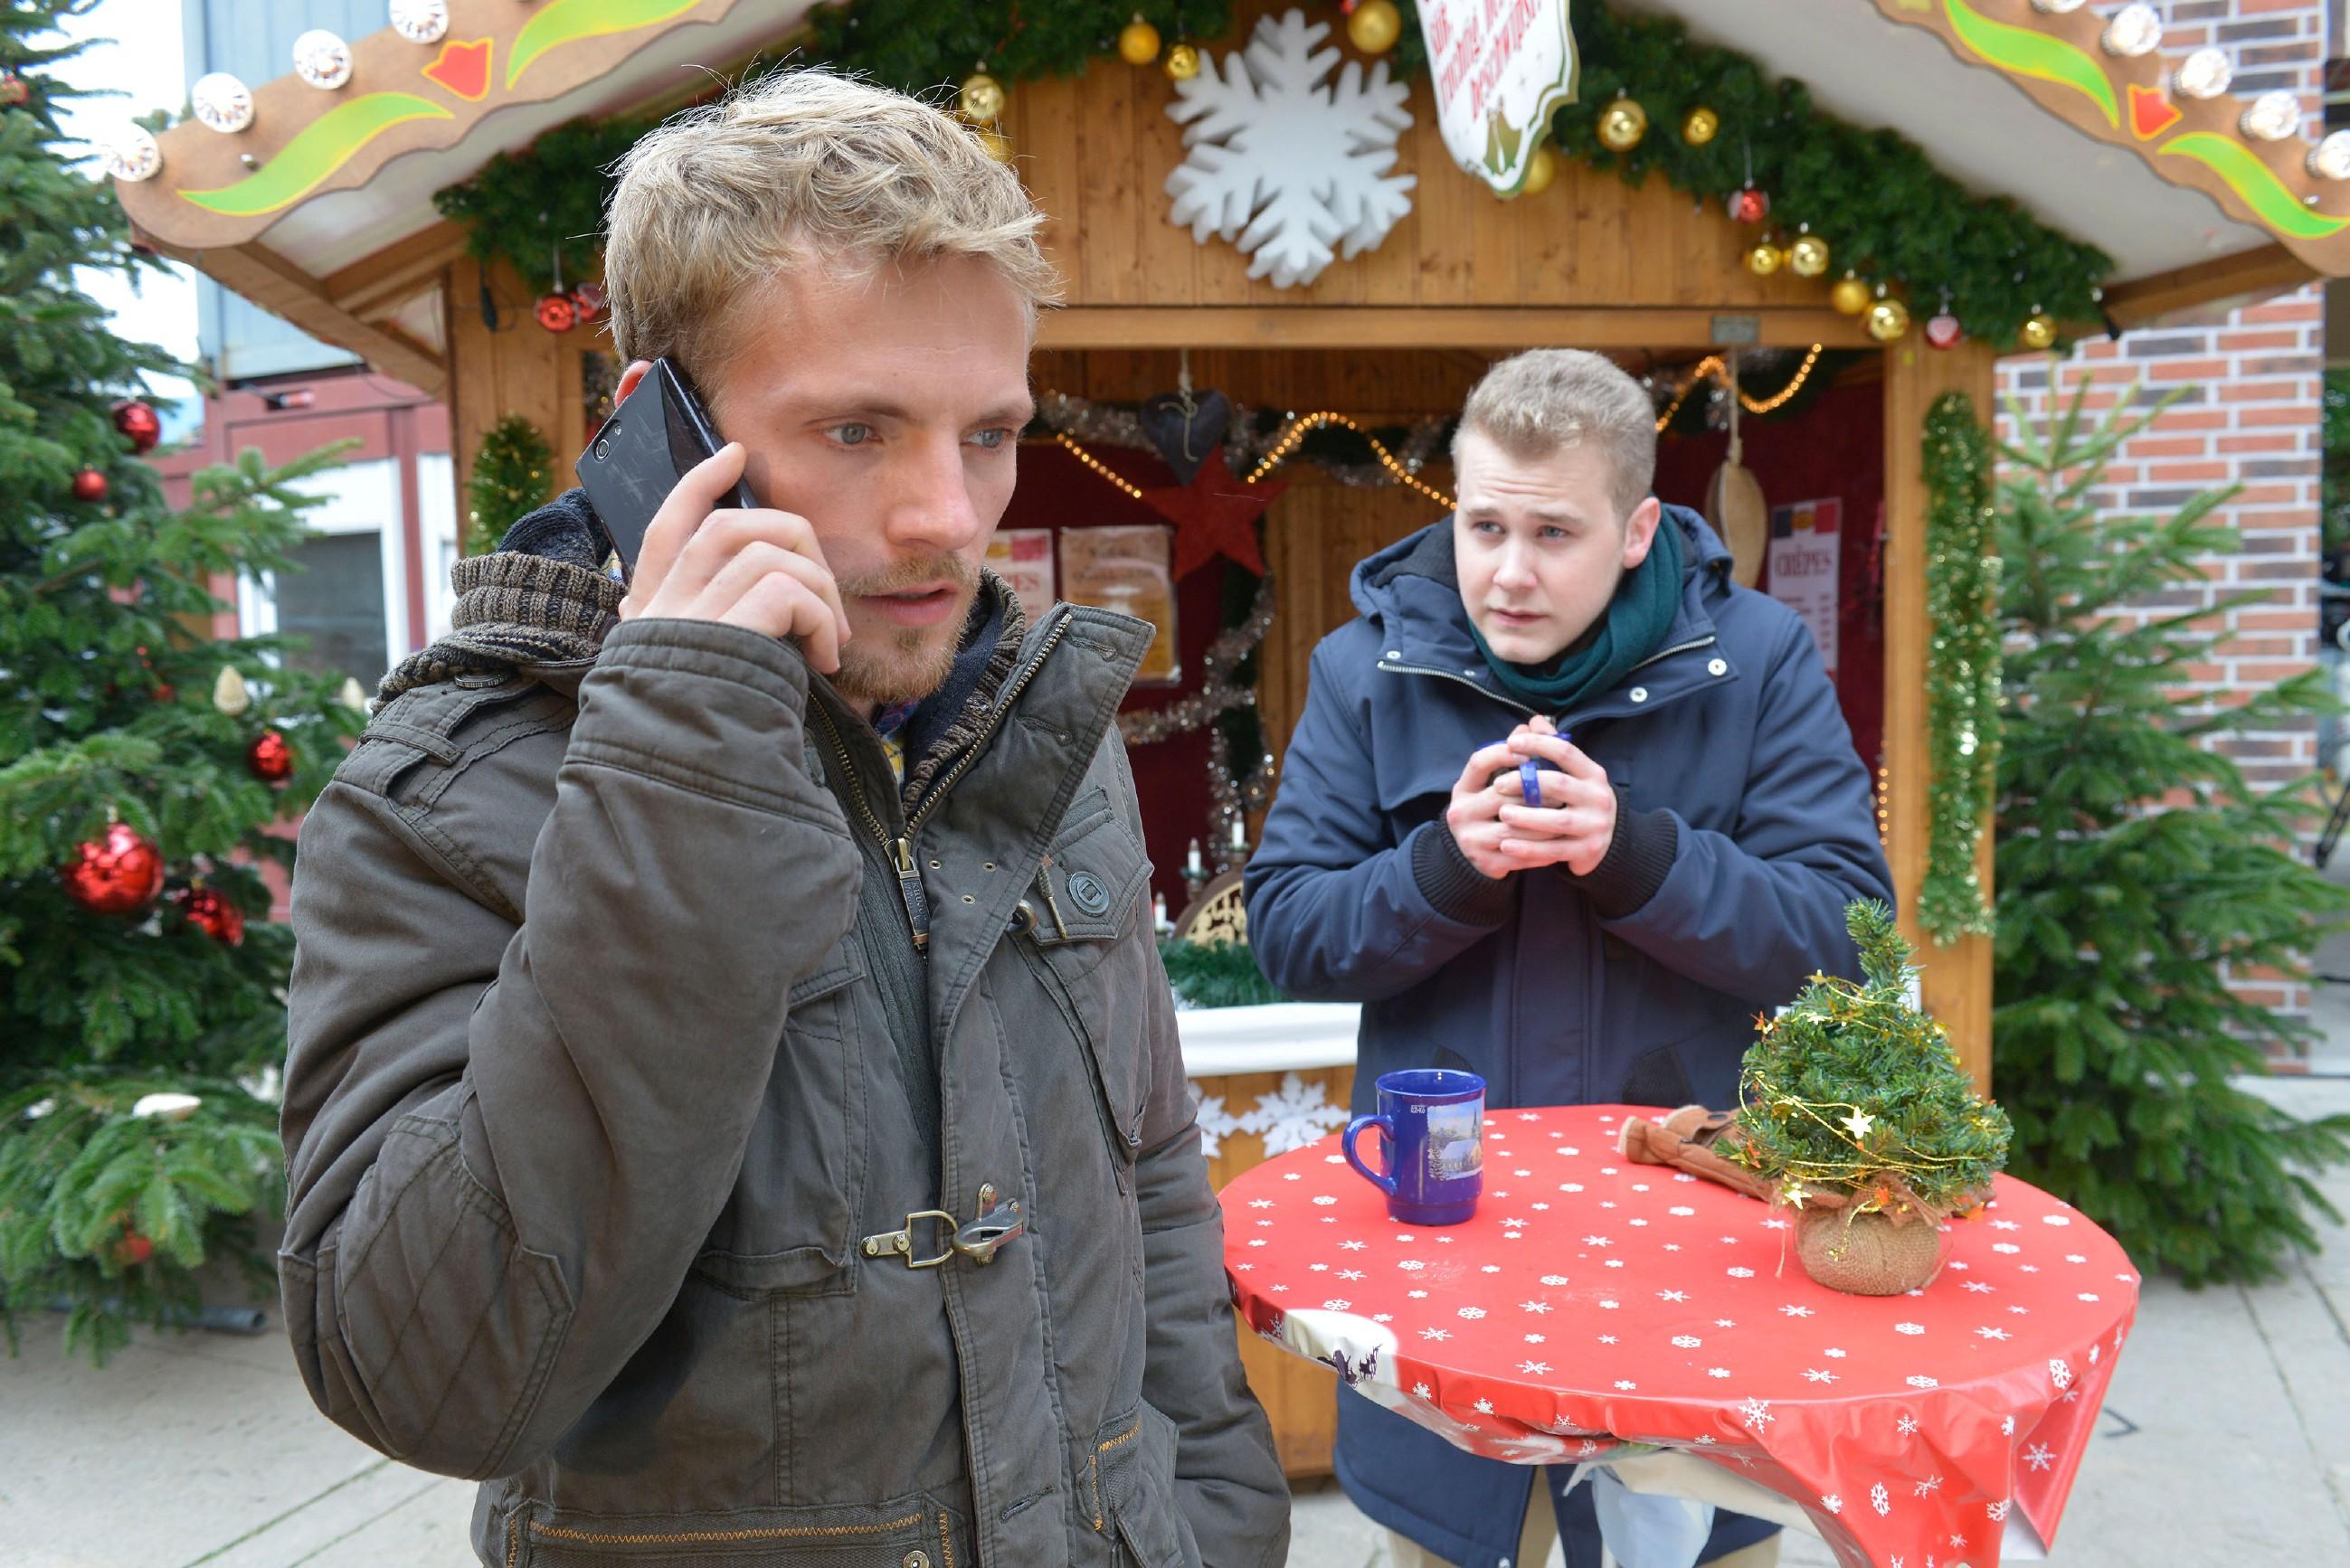 Dank Jonas' (Felix van Deventer, r.) kleiner Racheaktion meldet sich Pauls Ex-Freundin doch noch bei Paul (Niklas Osterloh)... (Quelle: RTL / Rolf Baumgartner)